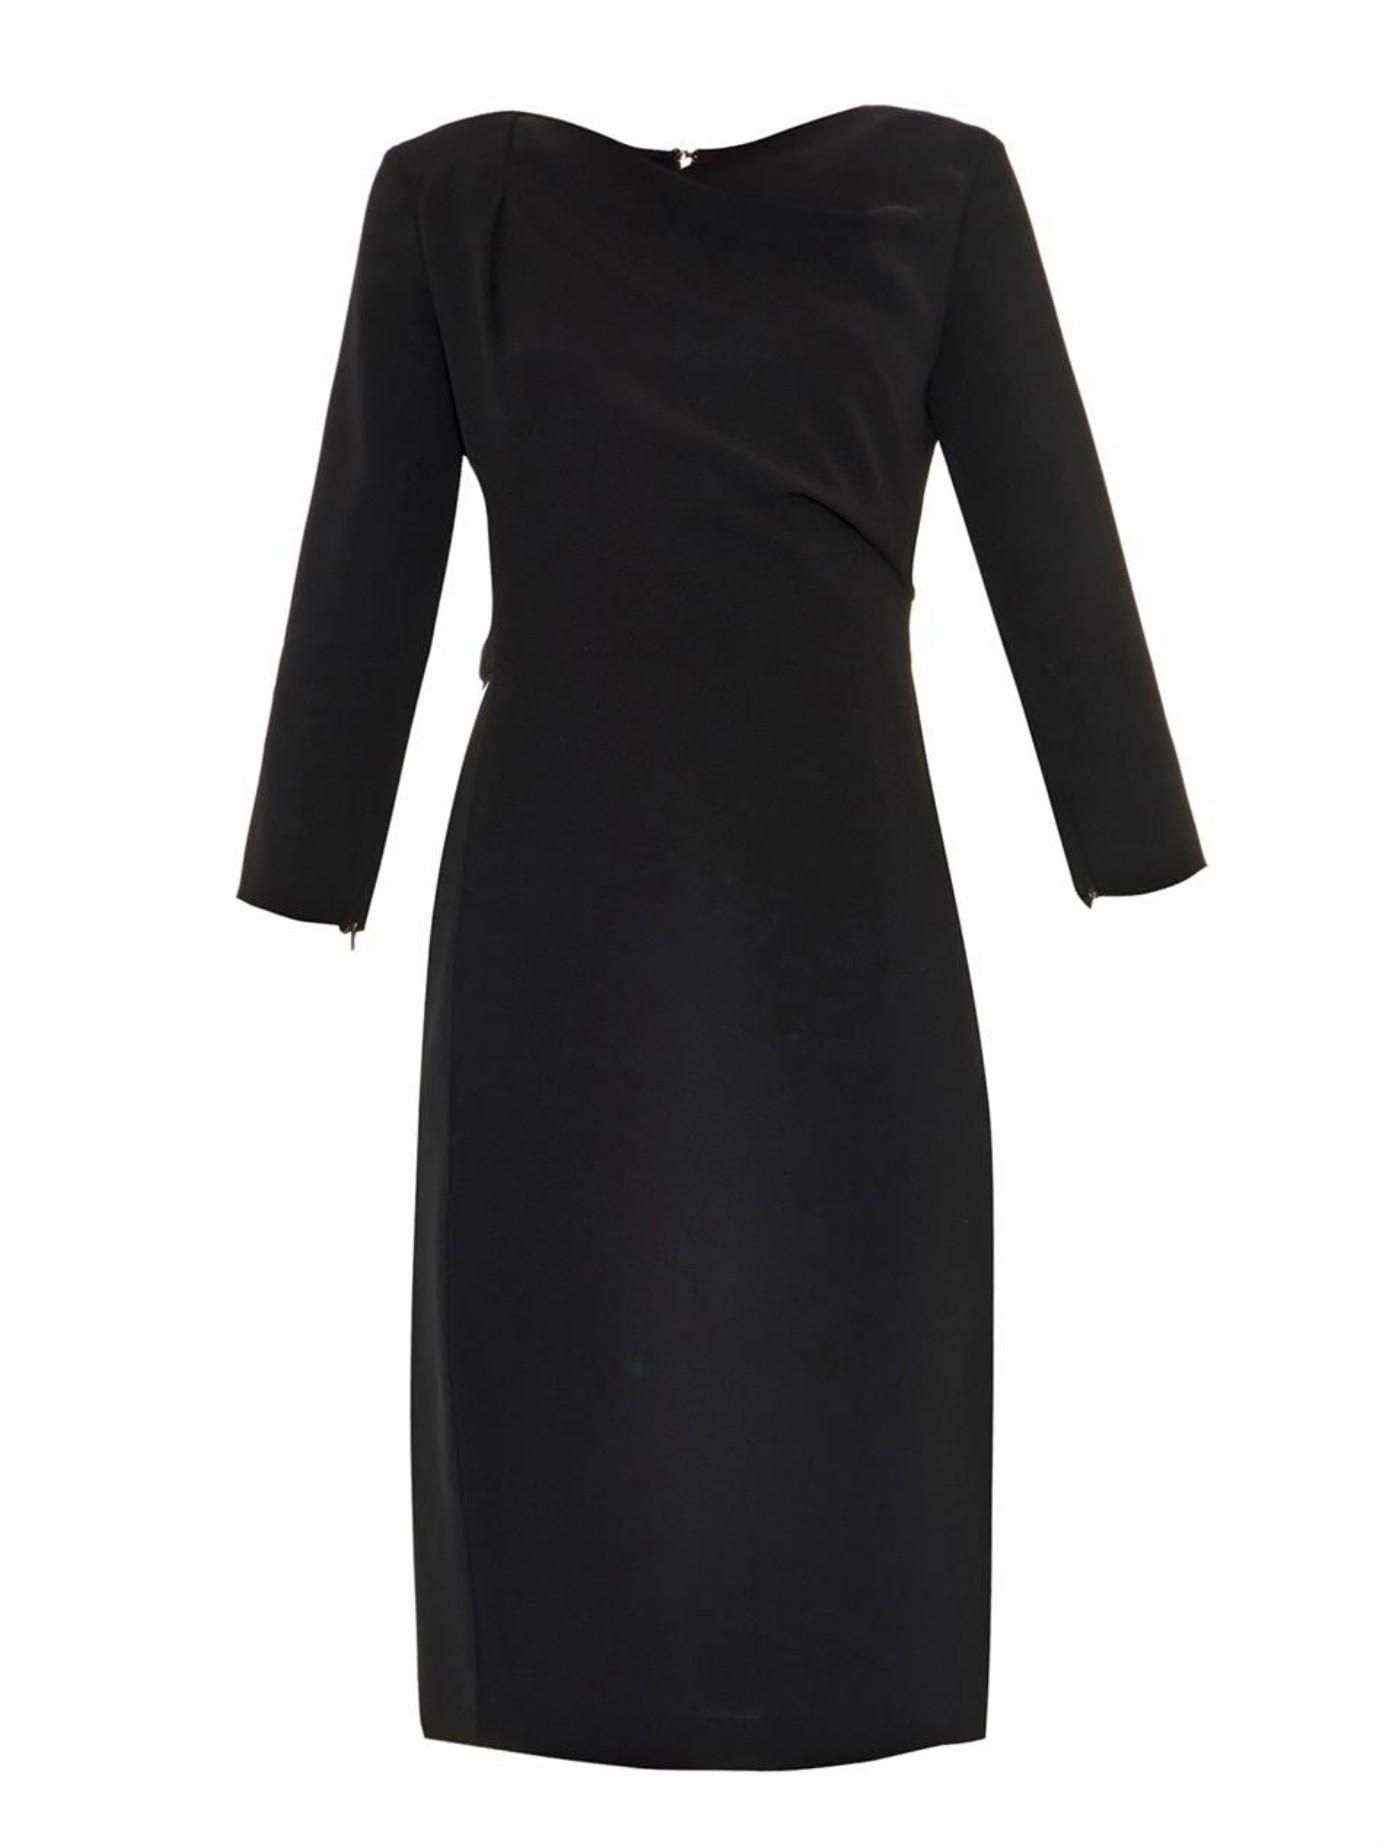 Max mara Lume Crepe Dress in Black - Lyst